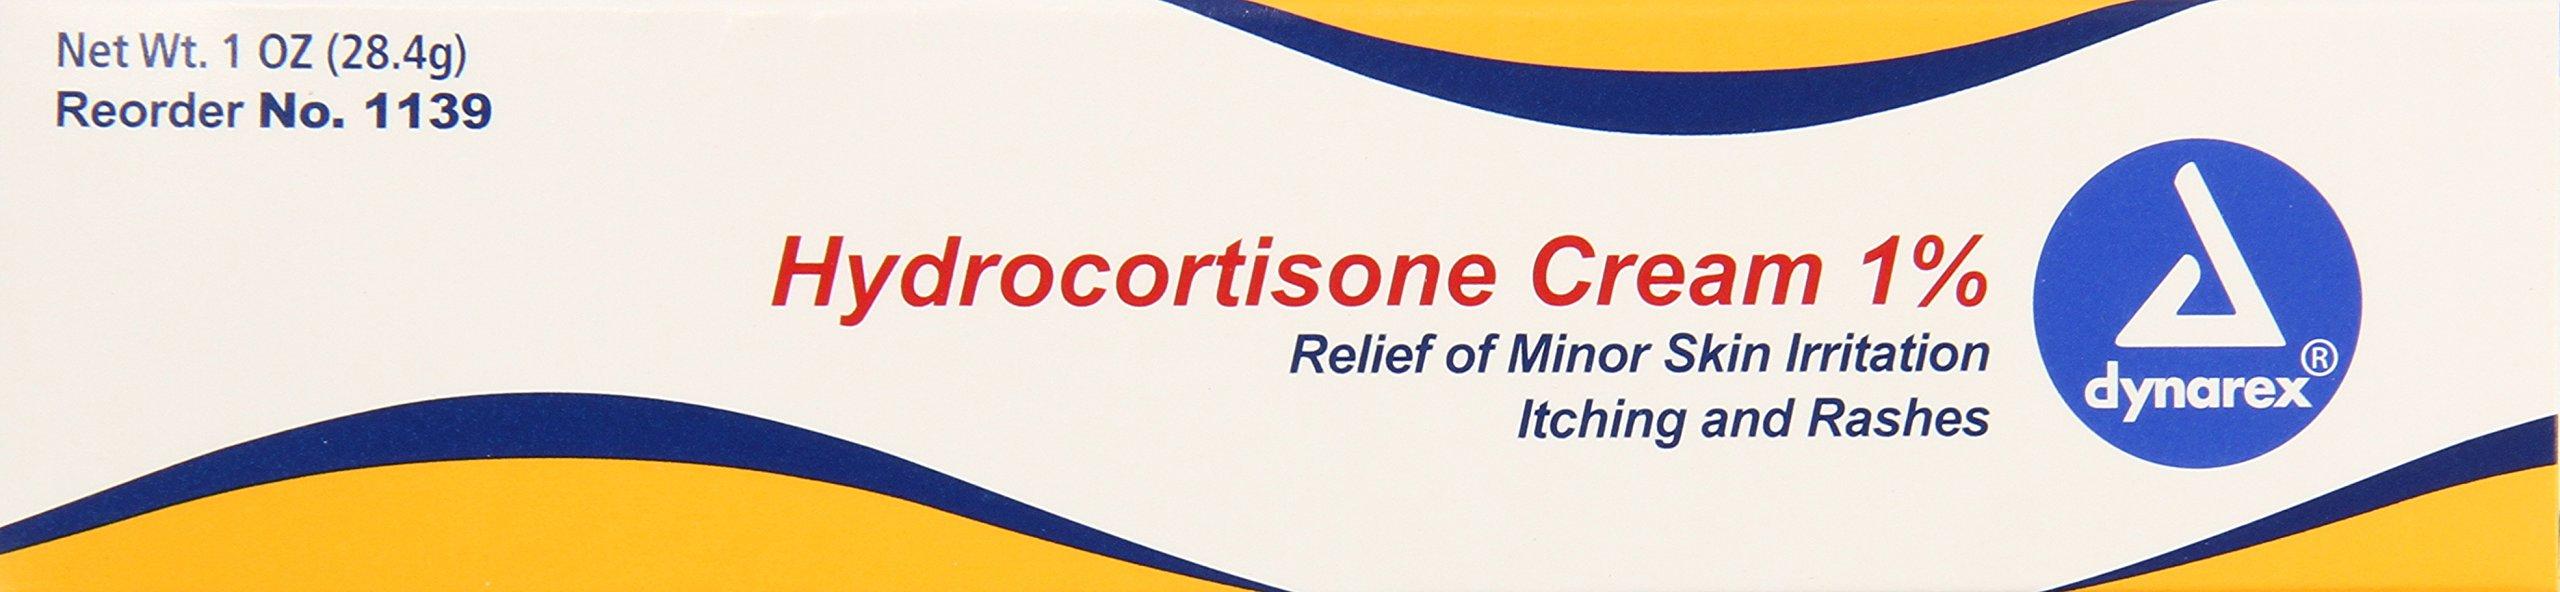 Dynarex Hydrocortisone Cream 1%, 1 oz Tube, 72-Count